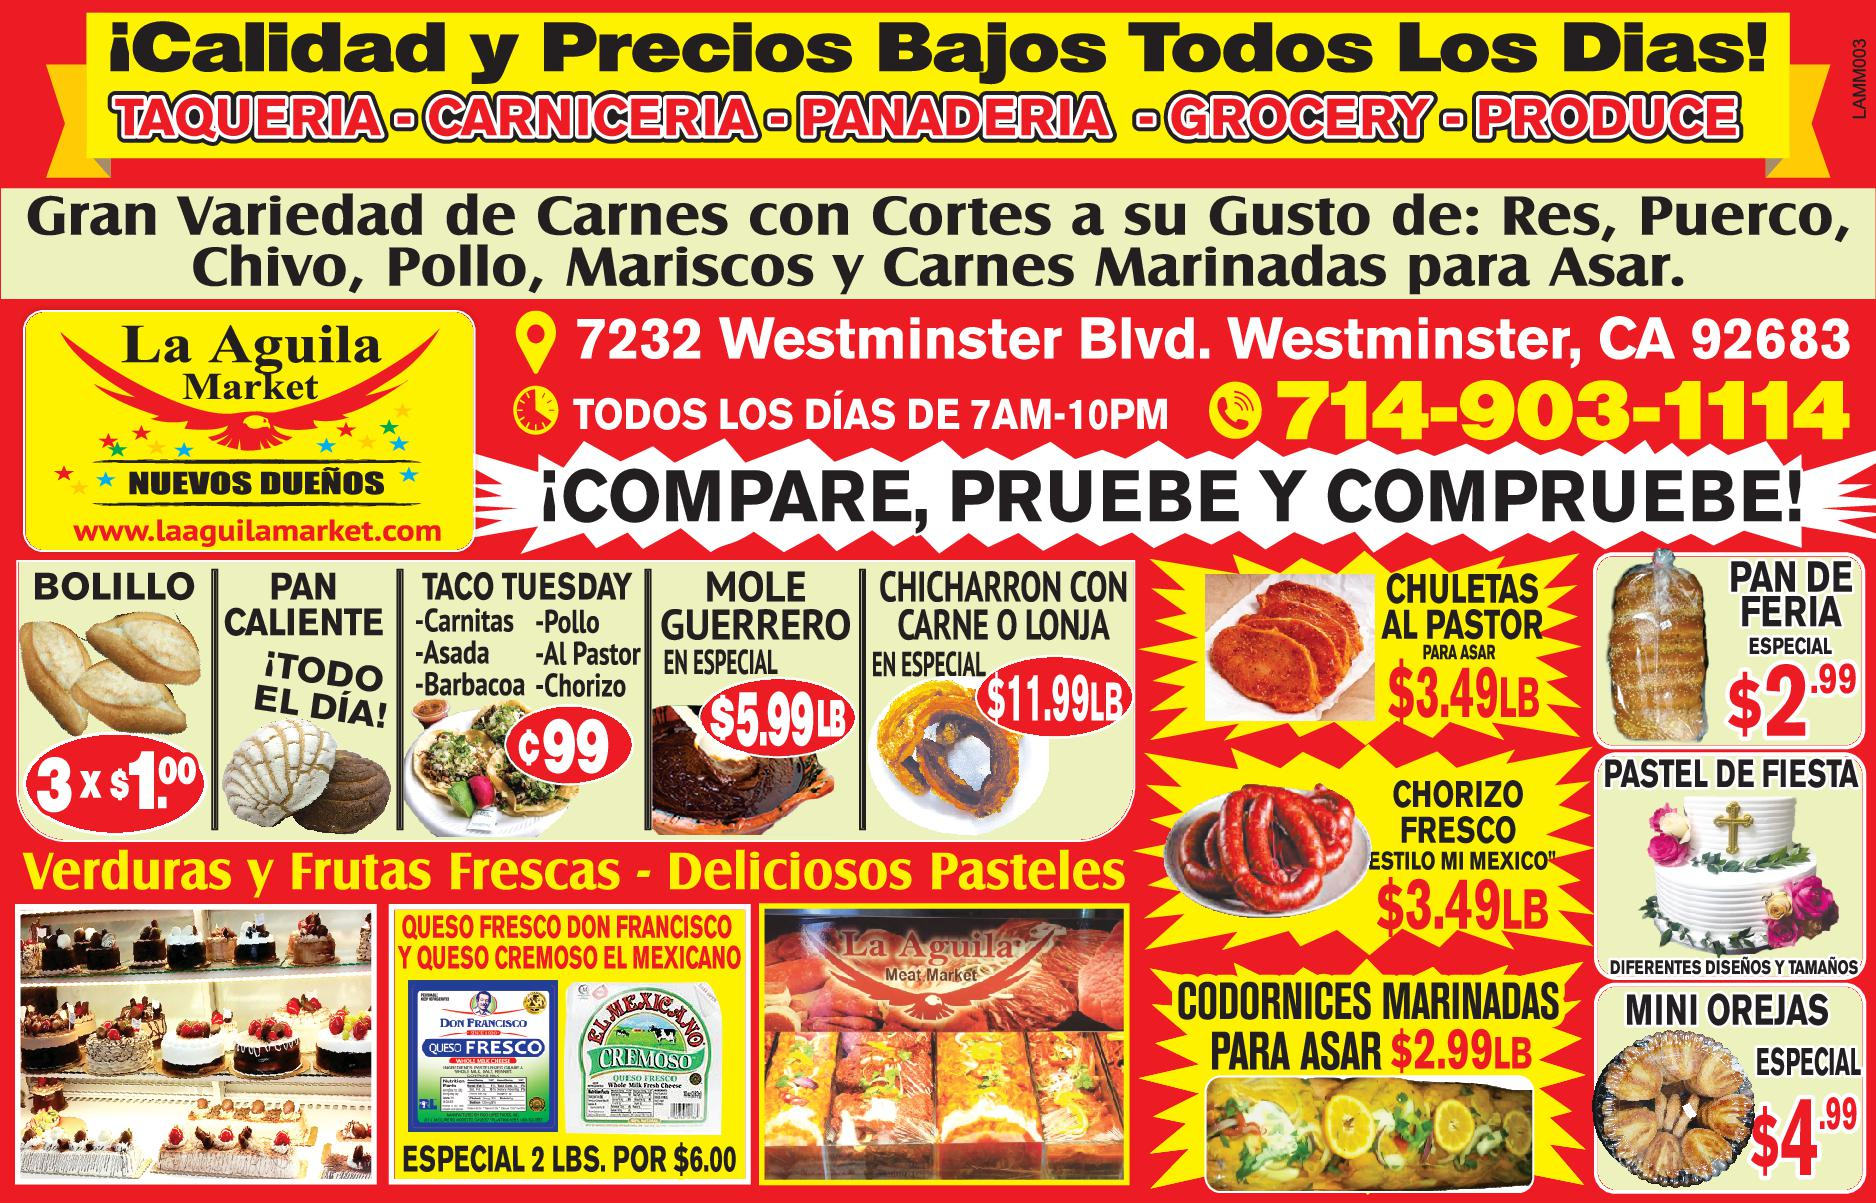 La Aguila Meat Market